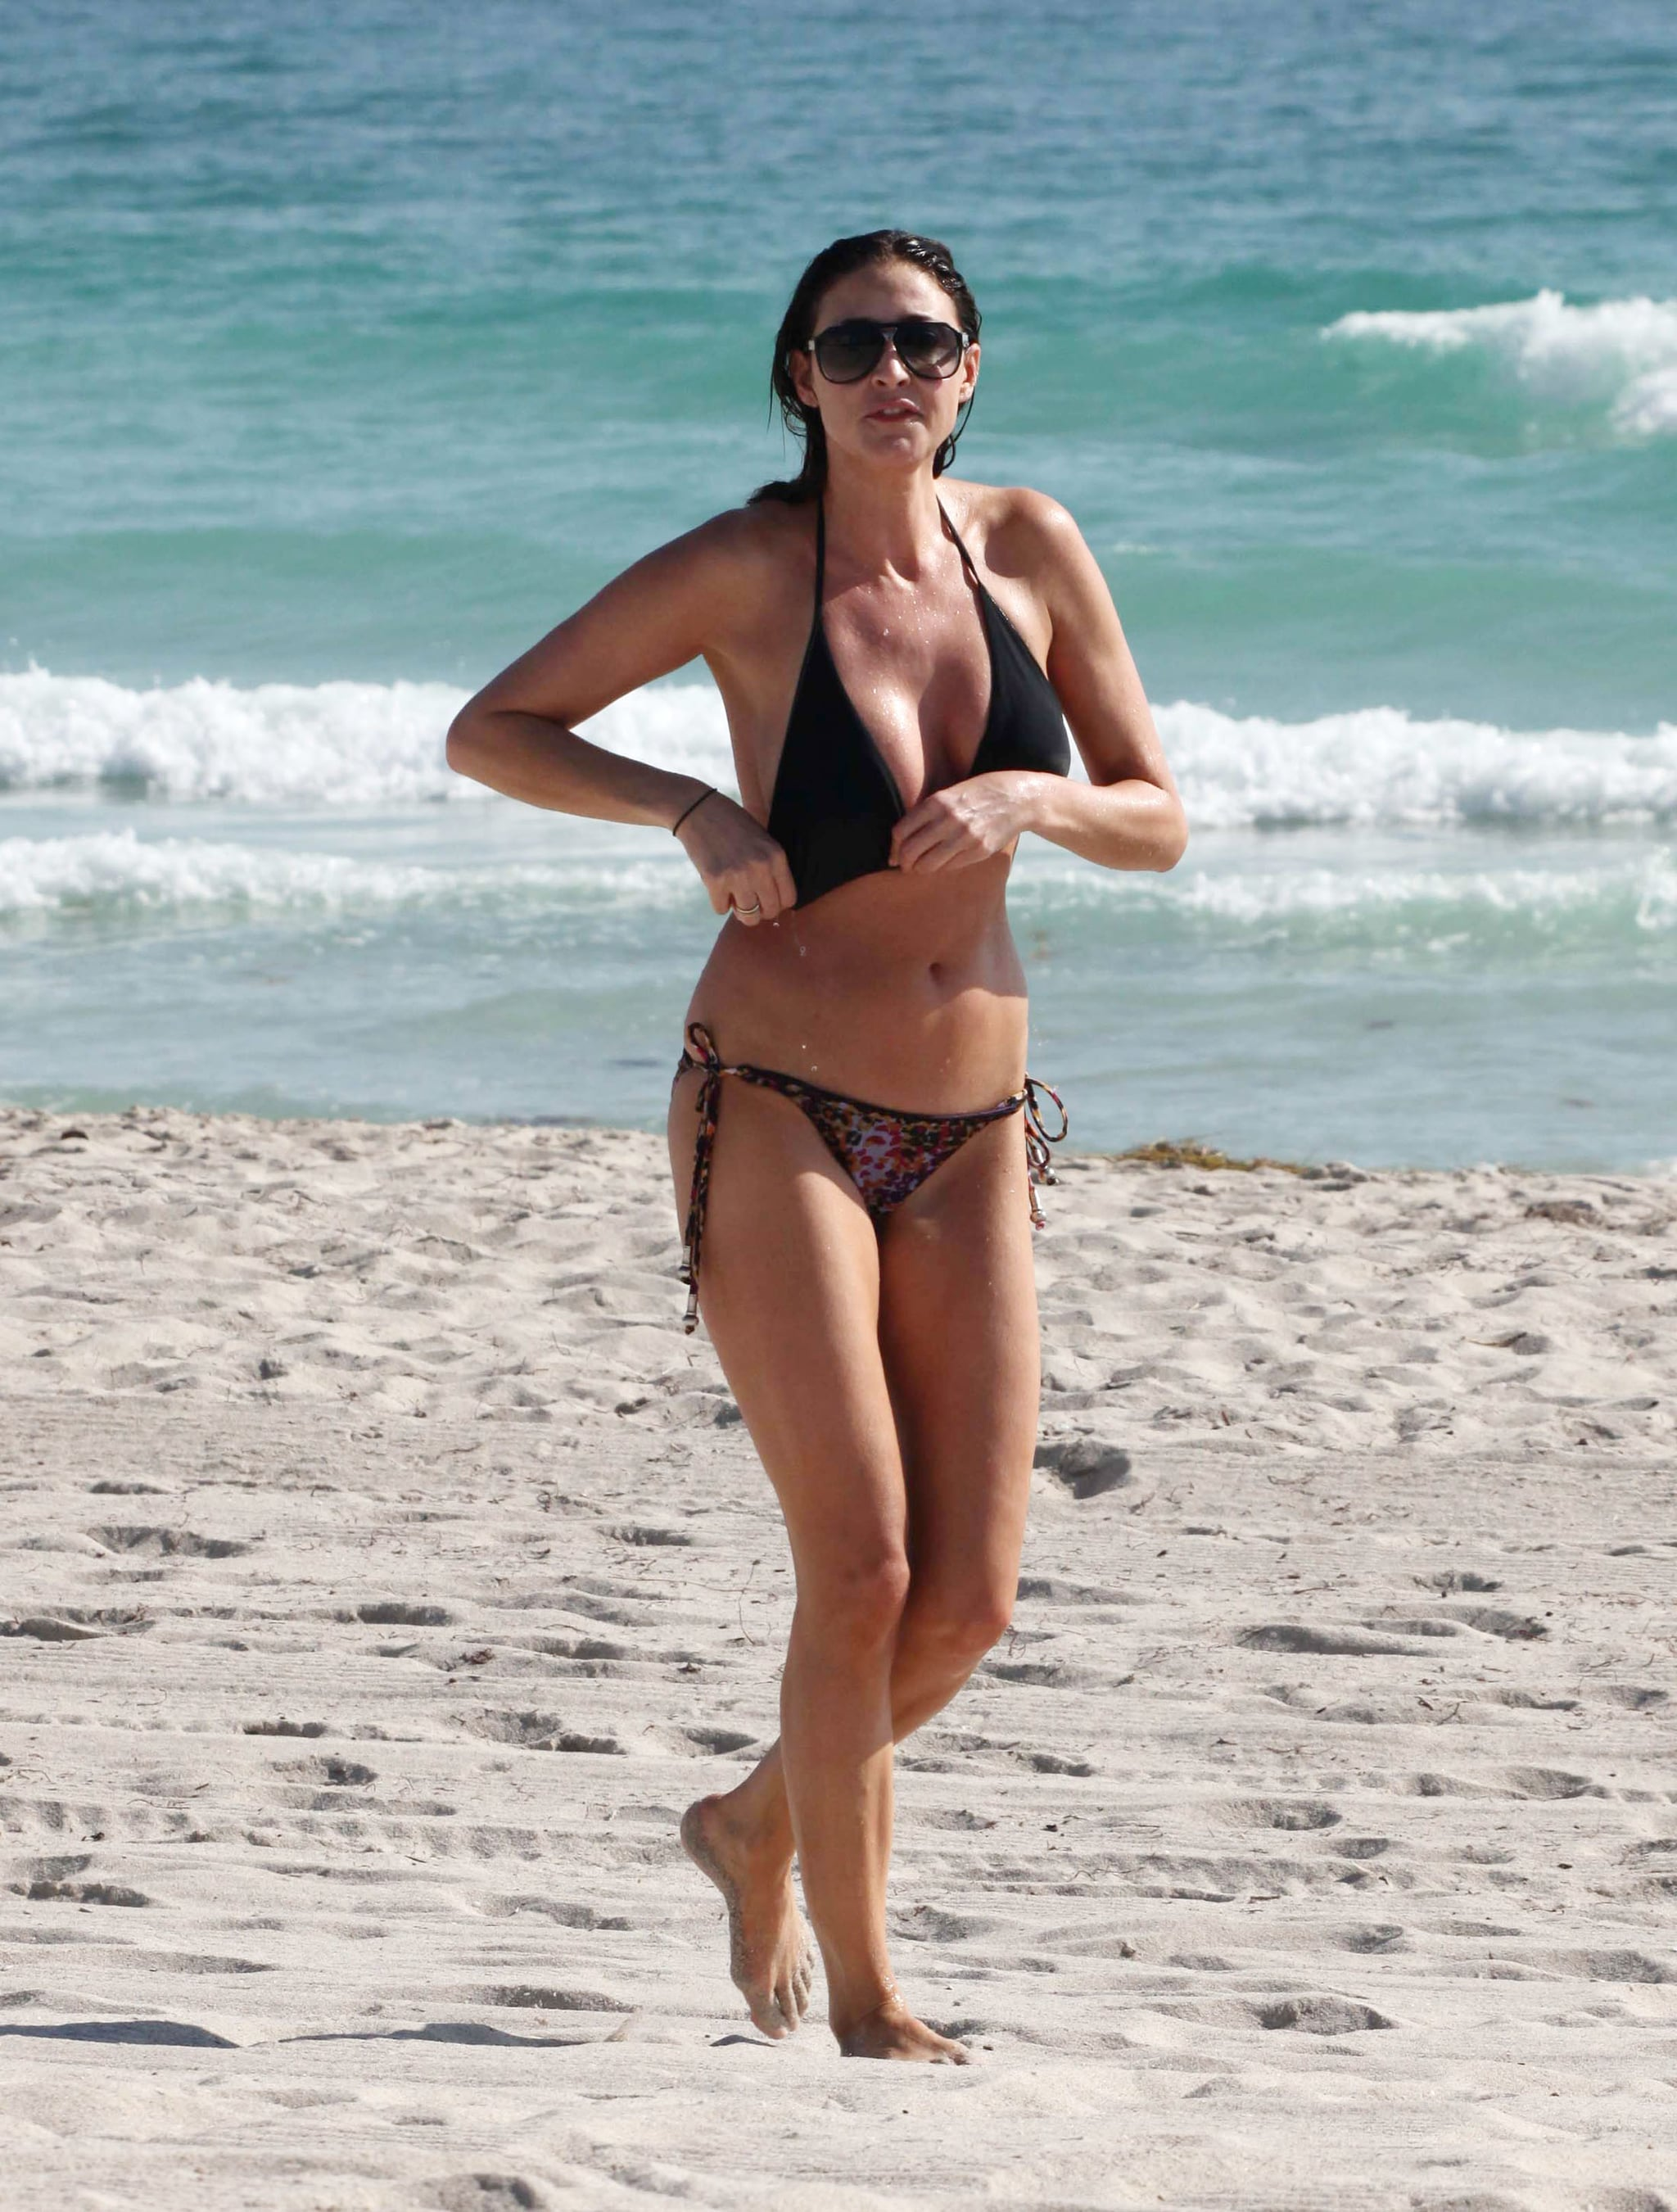 Bikini Lisa Snowdon nude photos 2019